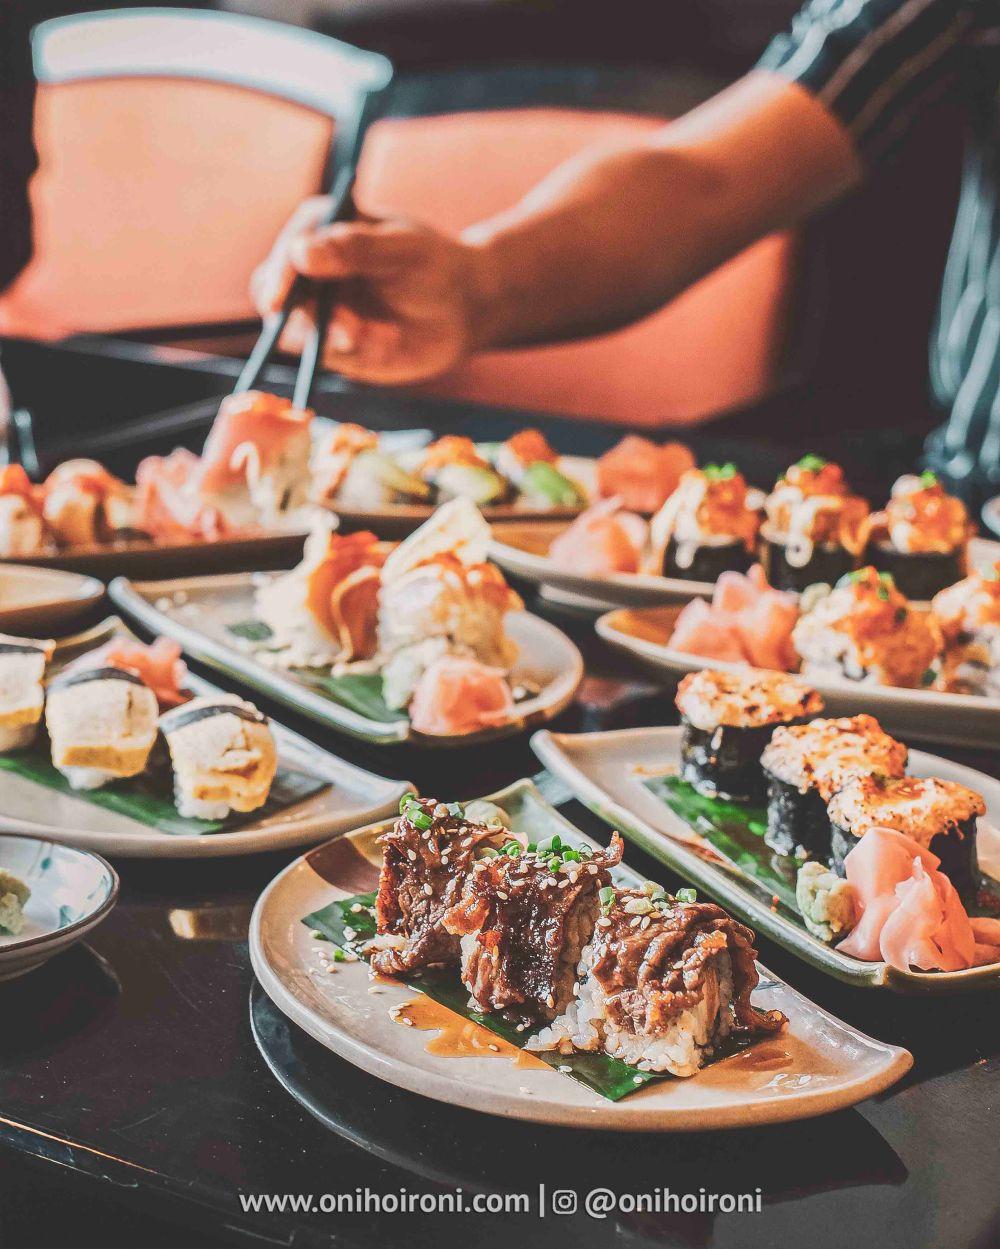 2 Review food makanan Nishimura restaurant Shangrila Surabaya Hotel Oni hoironi